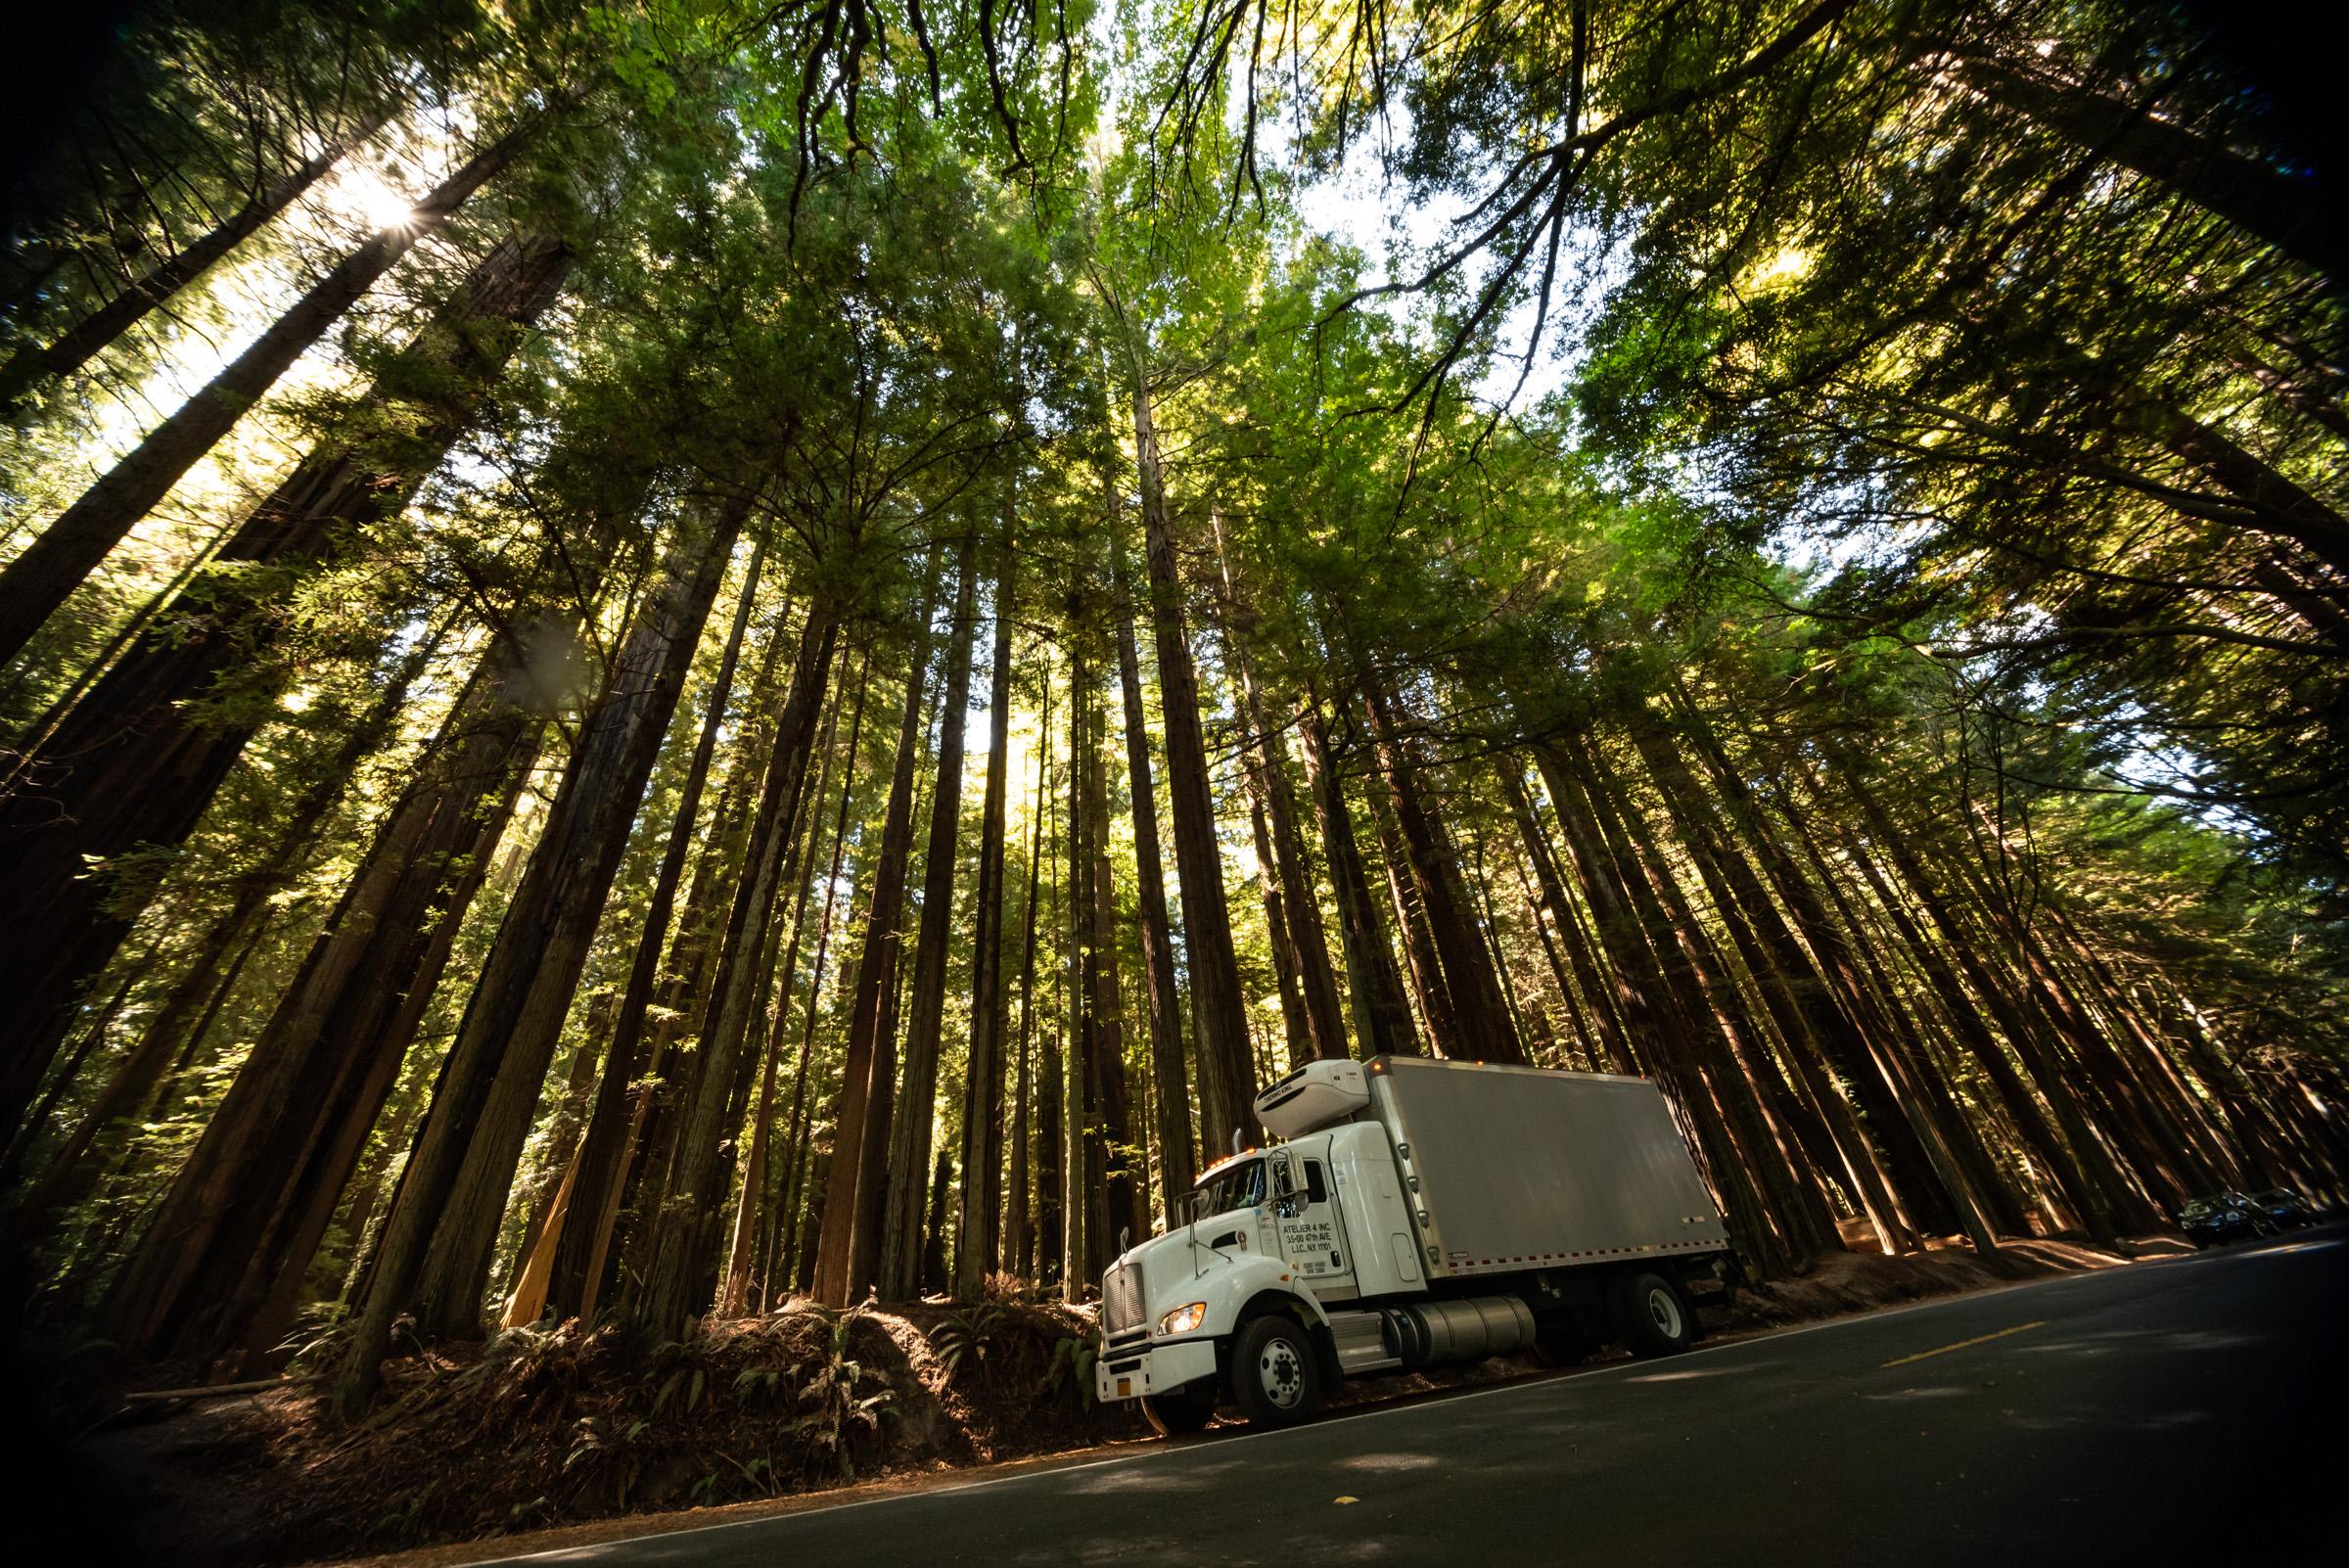 Redwoods_CourtesyBruceDailey